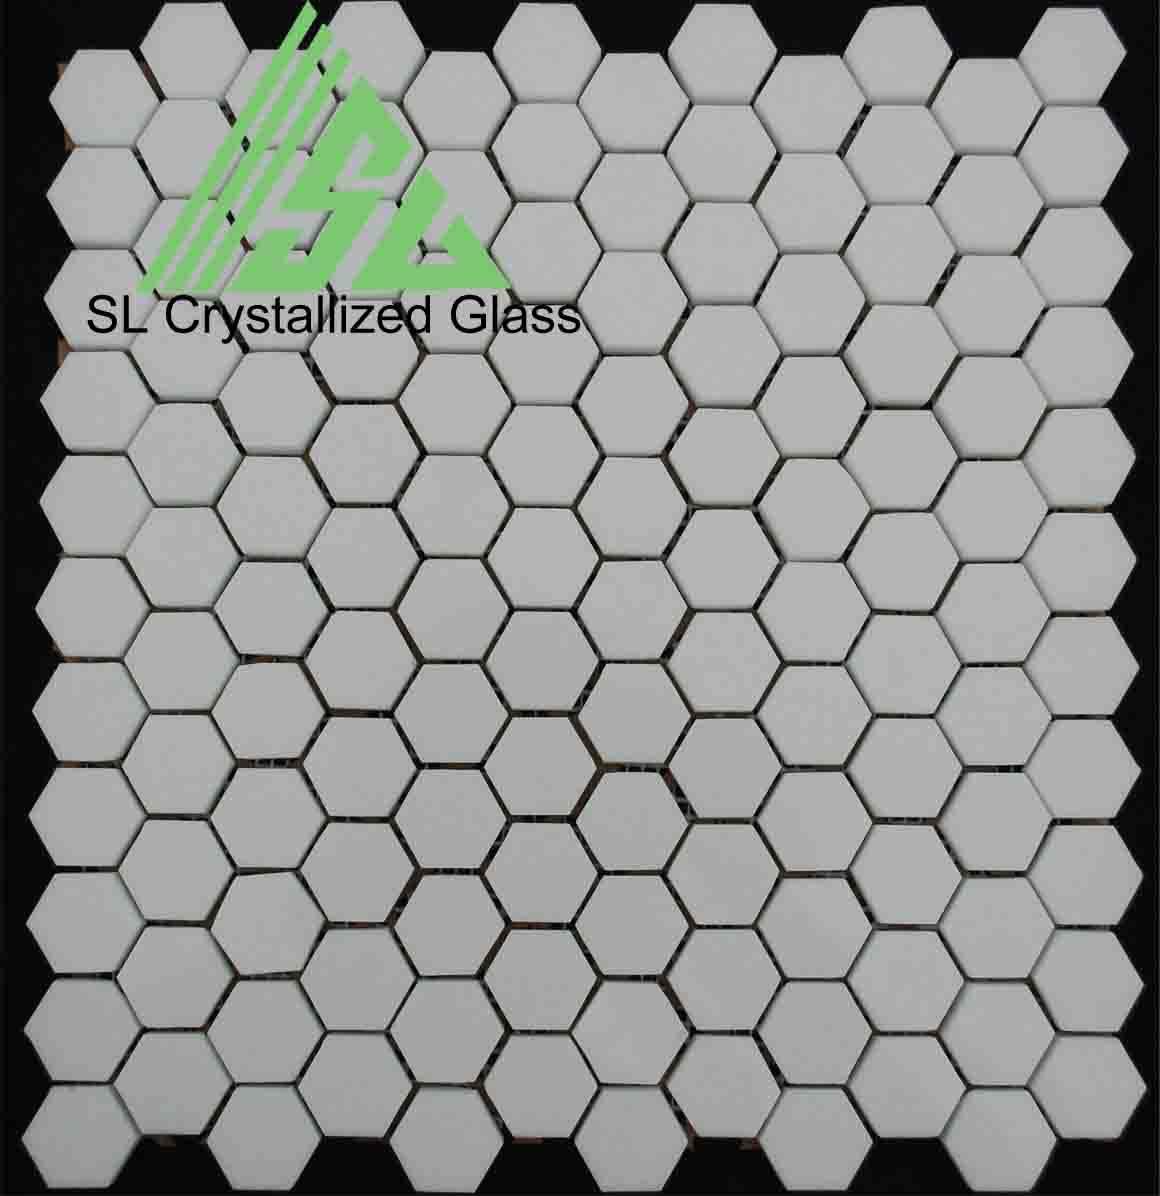 Crystallized glass hexagon mosaic